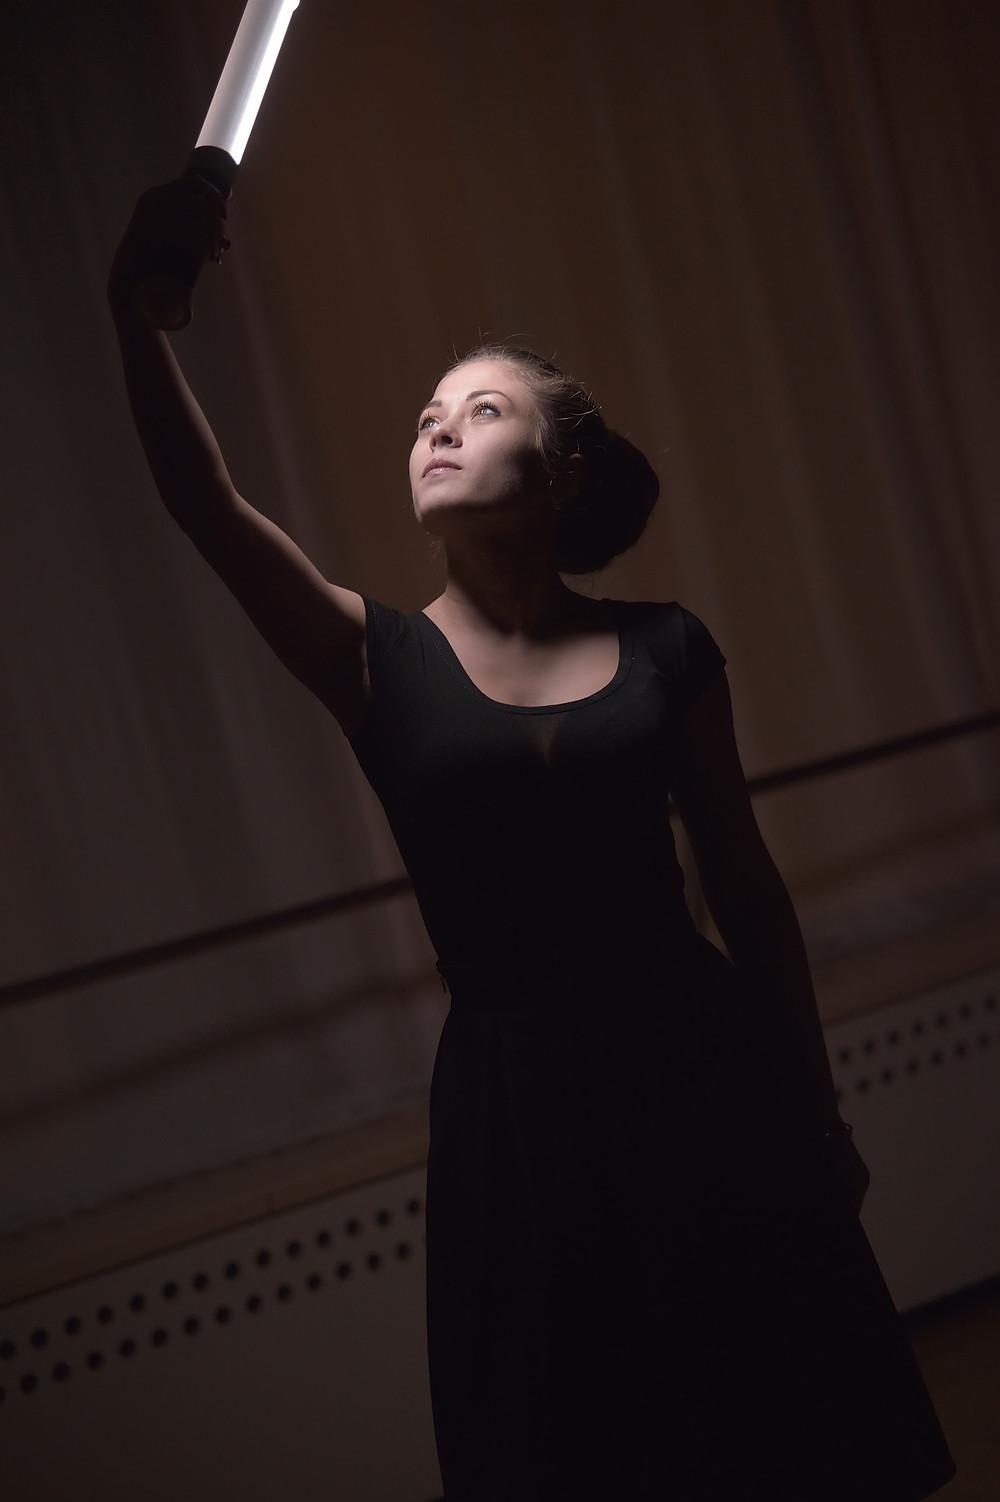 girl dance light nikondf devochka tanets svet tvorcheskaia fotoart photo dancing